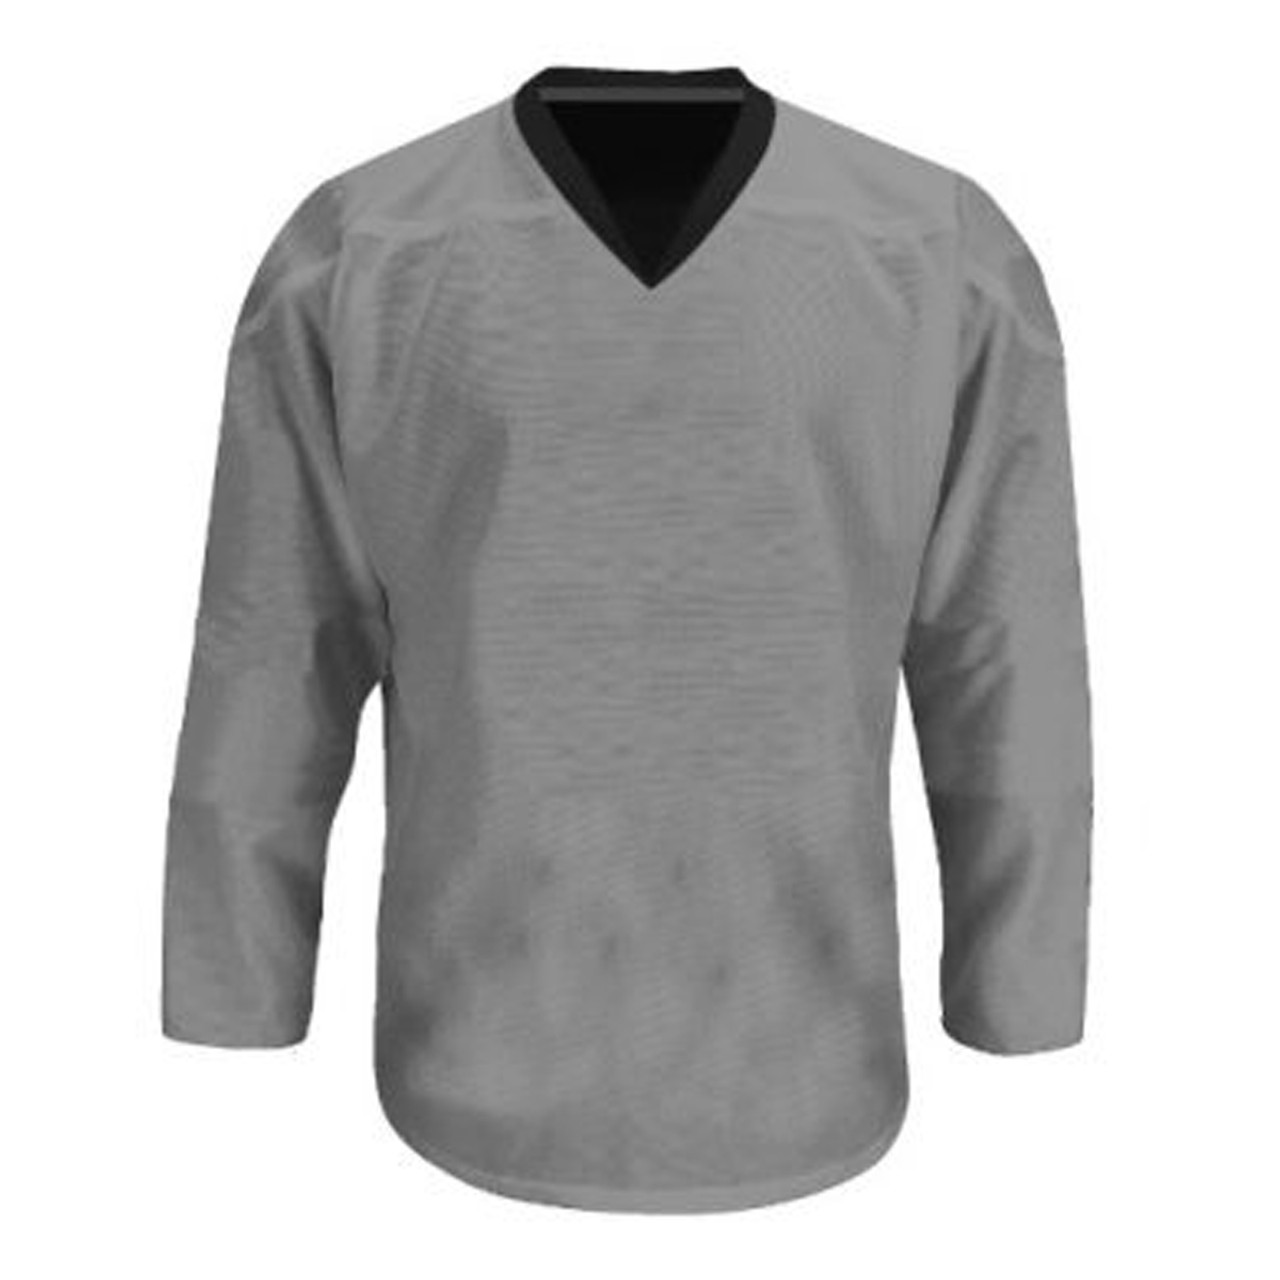 buy online c9a53 f8e9b Troy Hockey Reversible Senior Hockey Jersey - Black, Silver